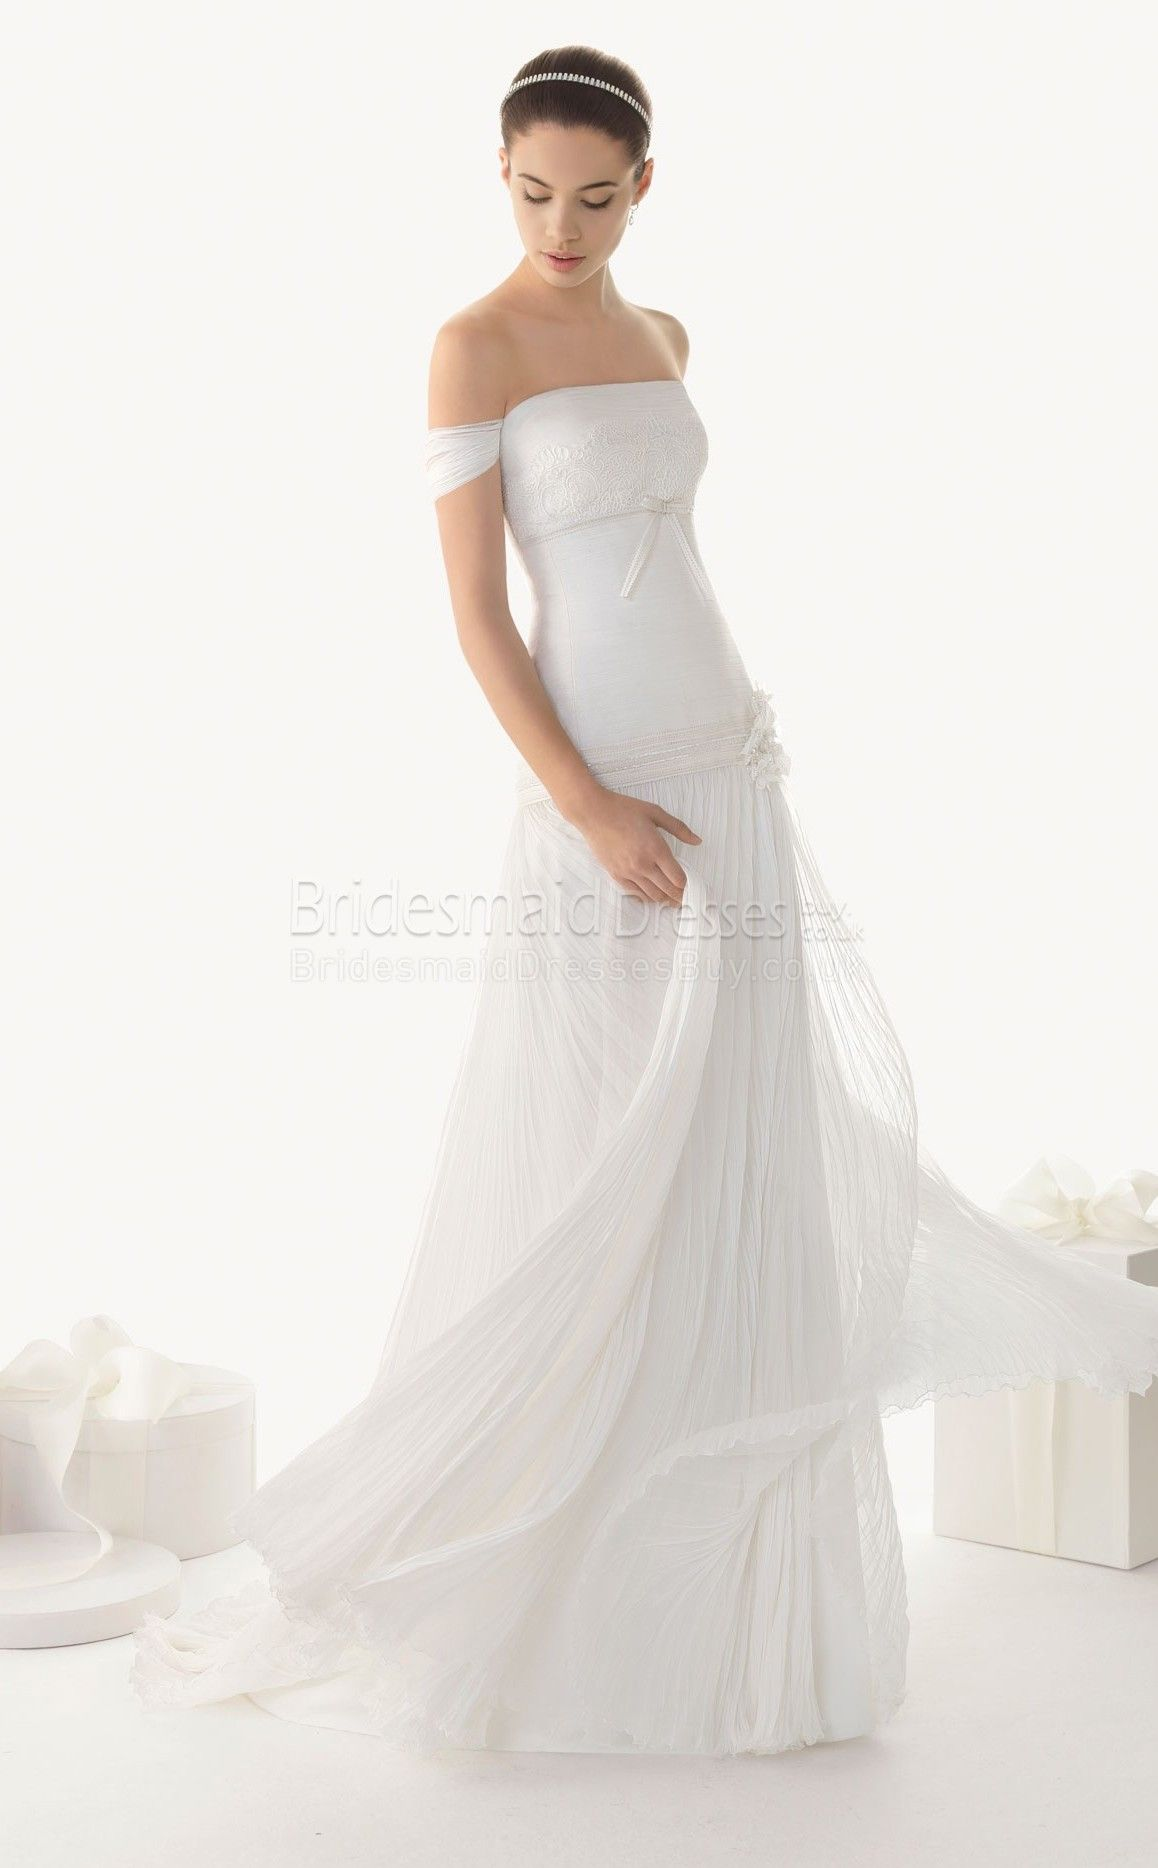 Simple wedding dresses cheap  beach wedding dressessimple wedding dresses digging the